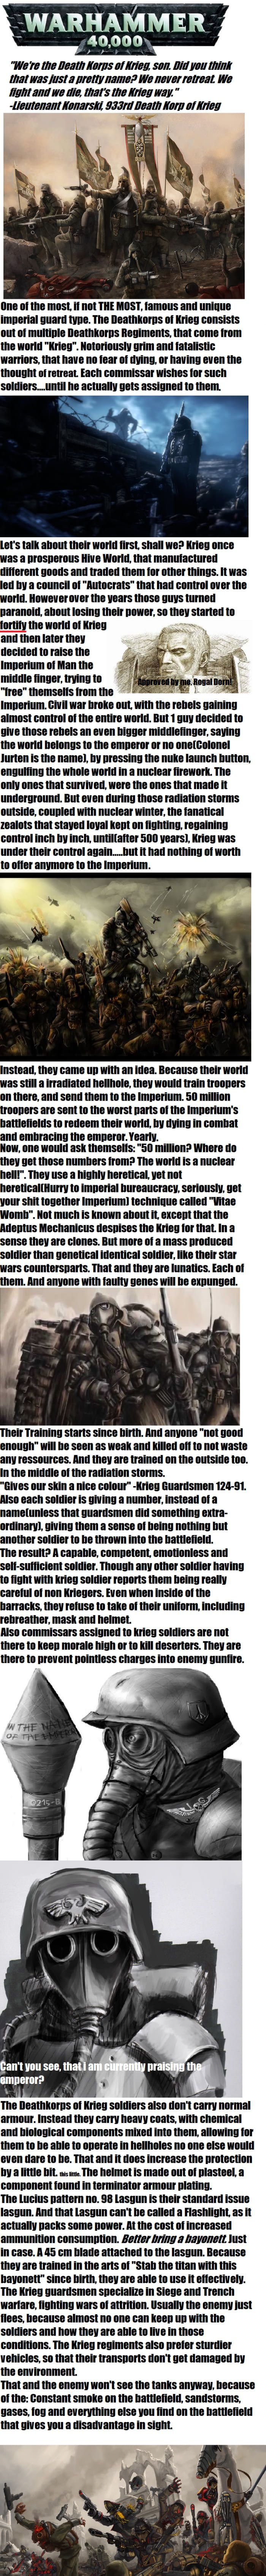 40k lore: Deathkorps of Krieg